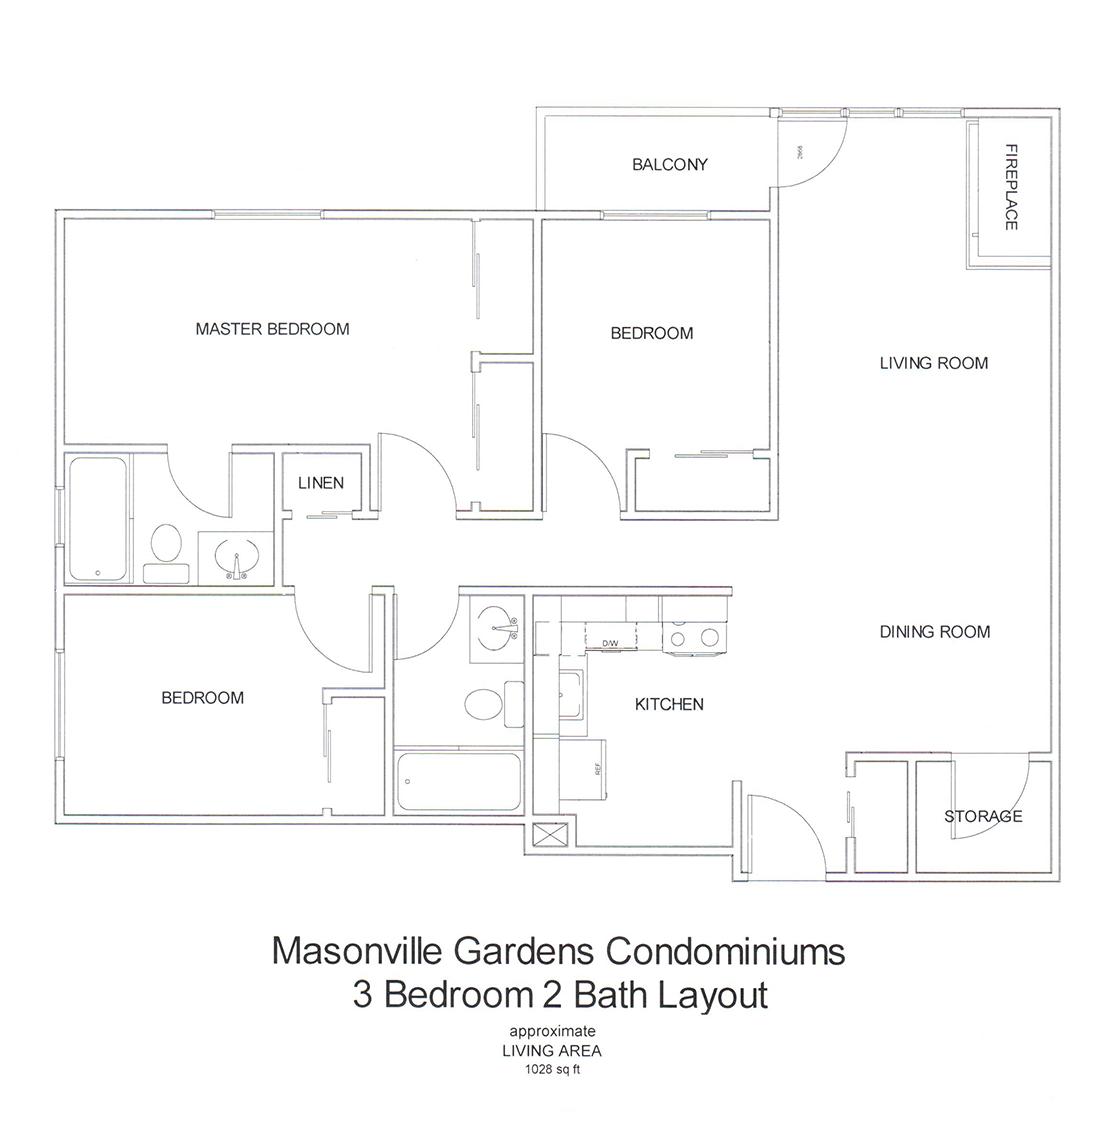 deluxe apartment condominiums for rent in london ontario